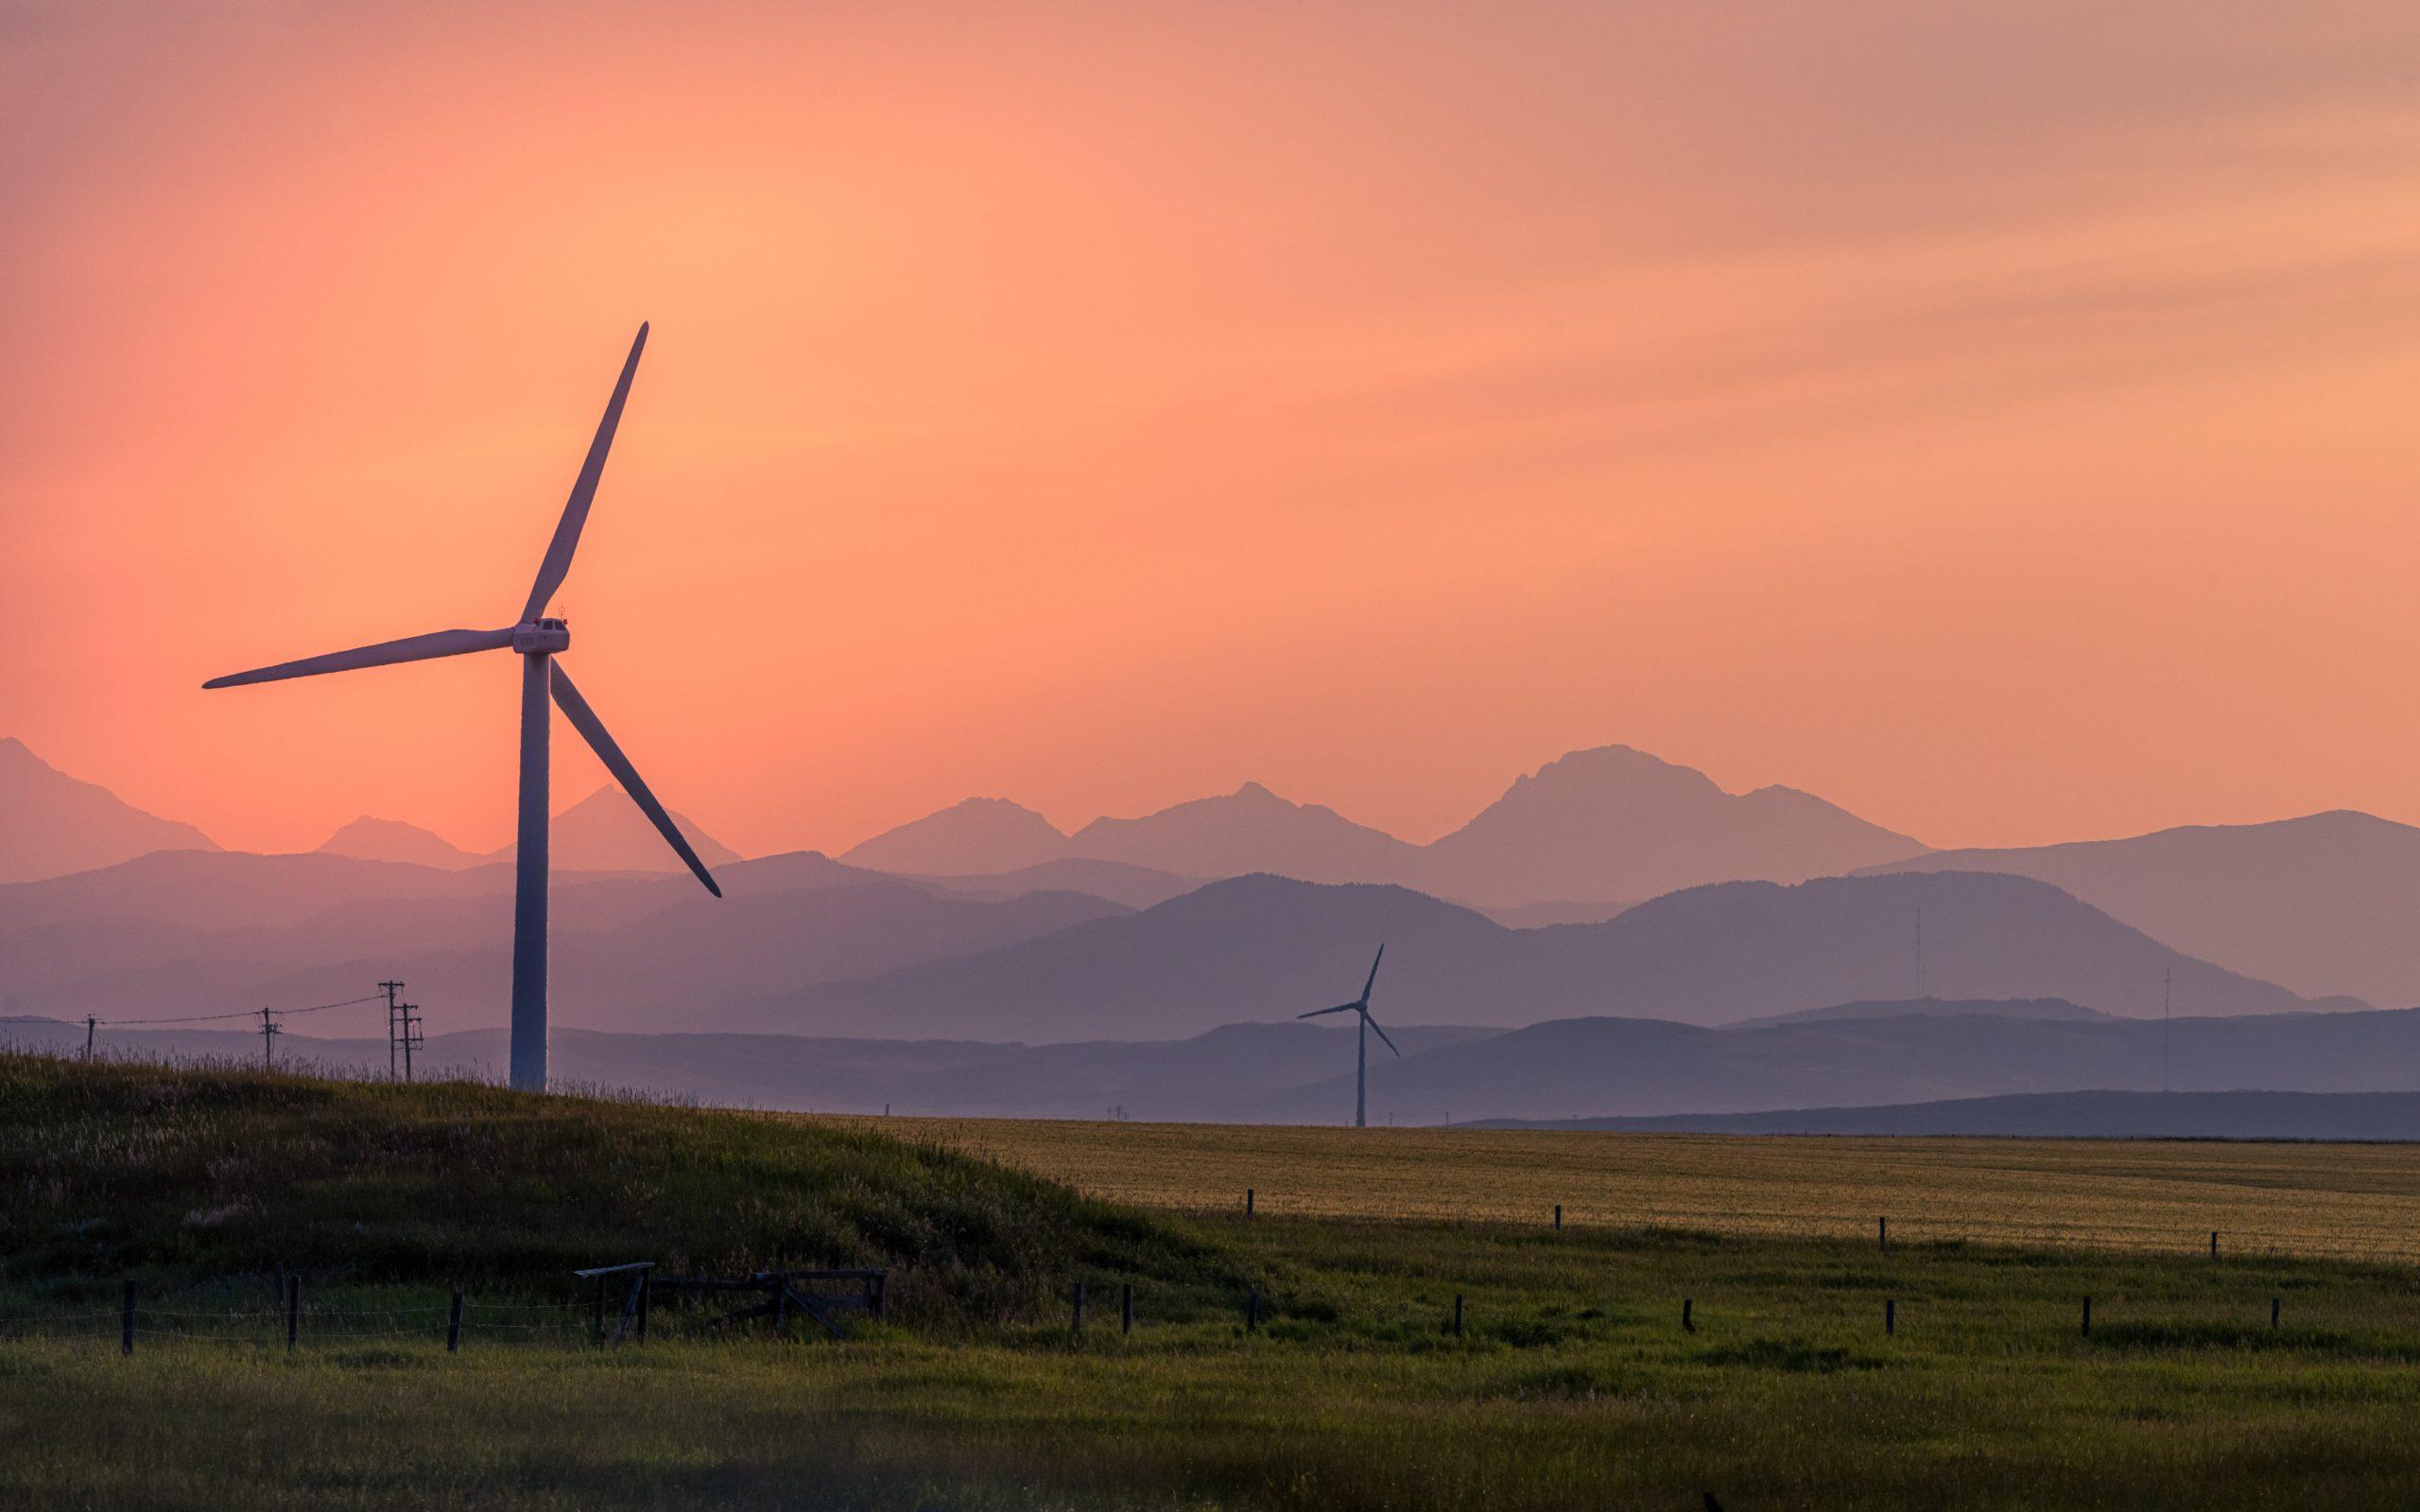 Cowley Landscape Windmill